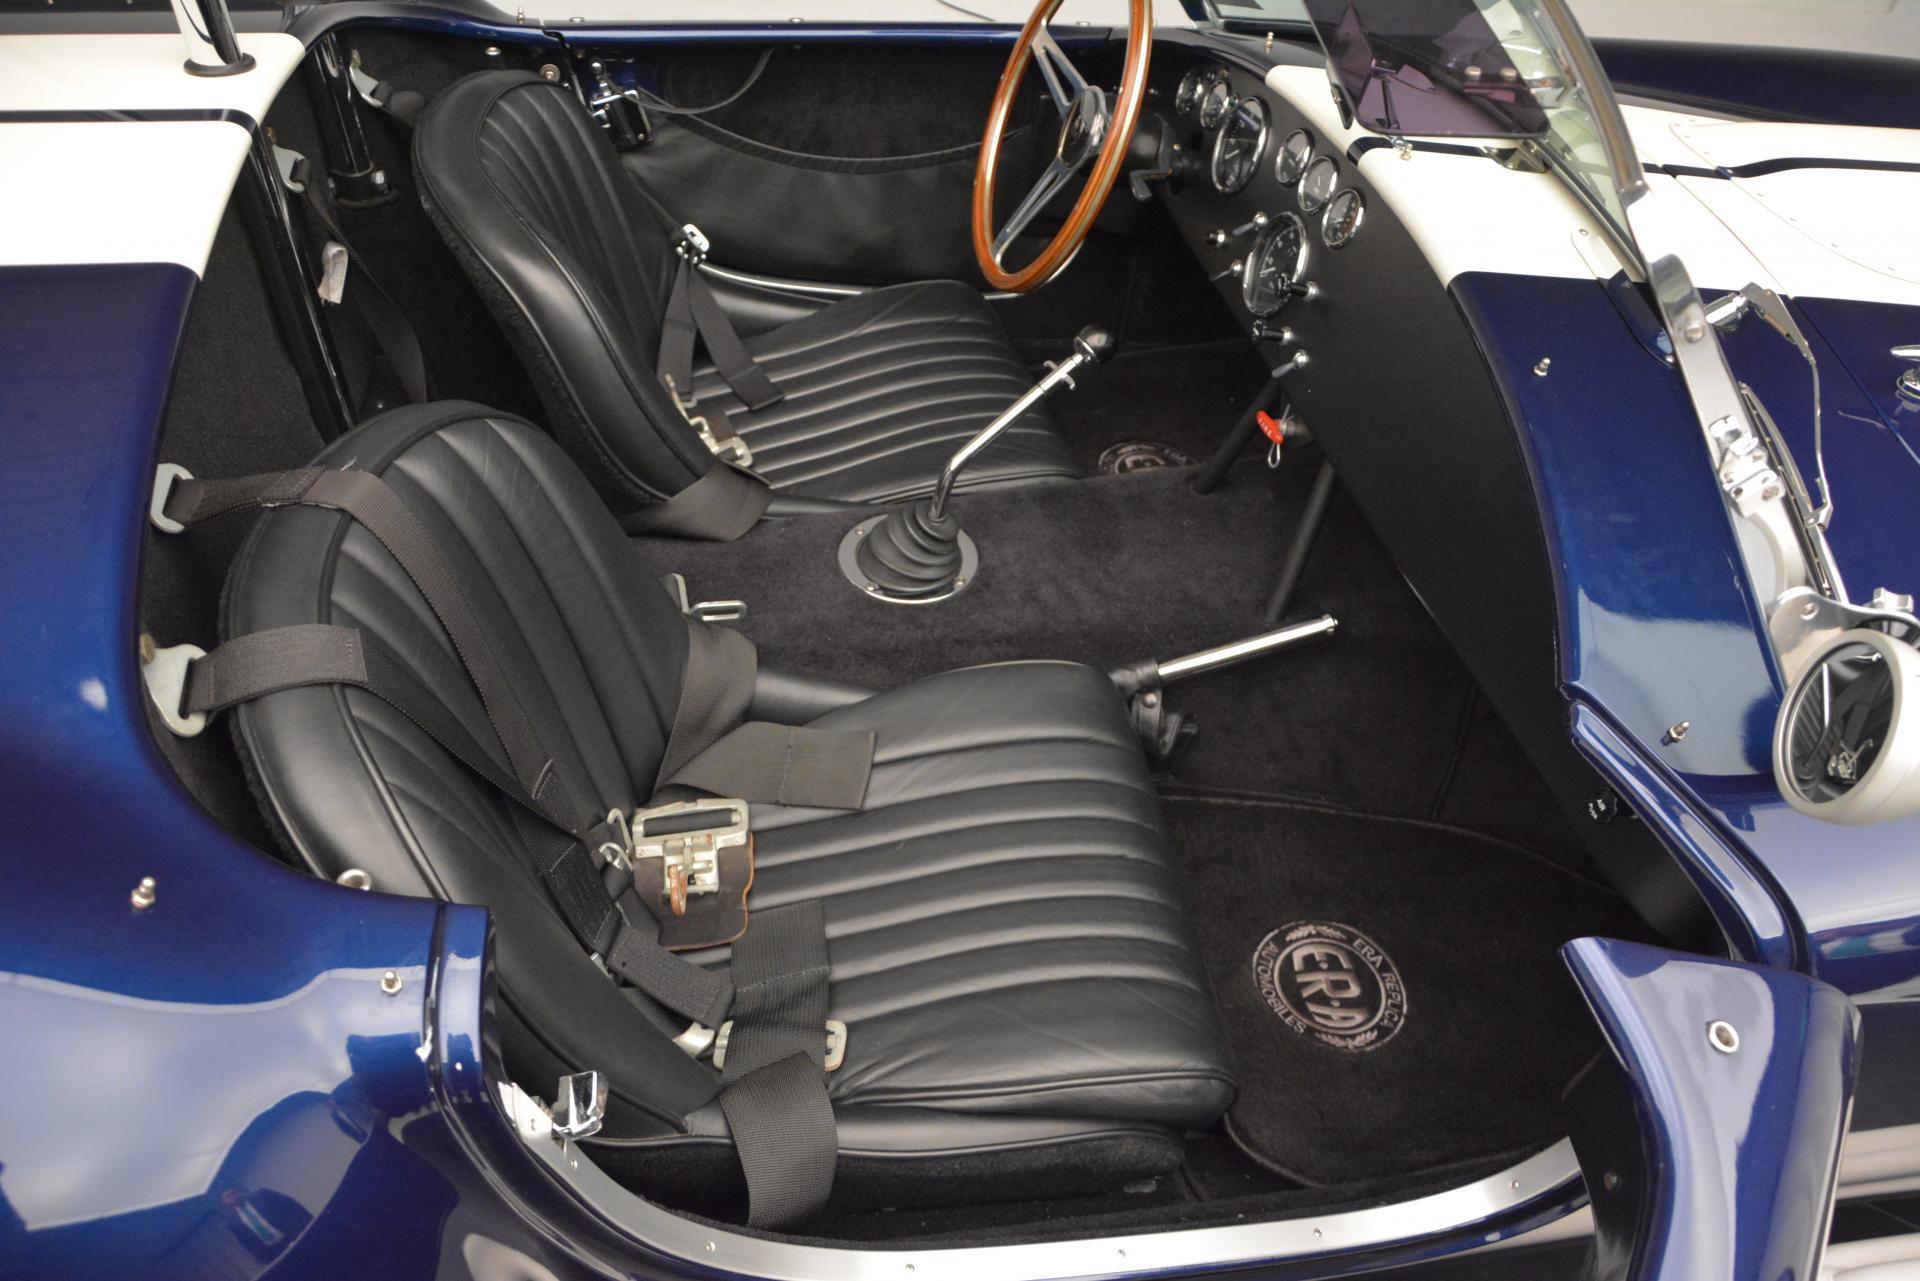 Used 2006 Ford ERA 427 SC  For Sale In Greenwich, CT. Alfa Romeo of Greenwich, 7051 107_p17